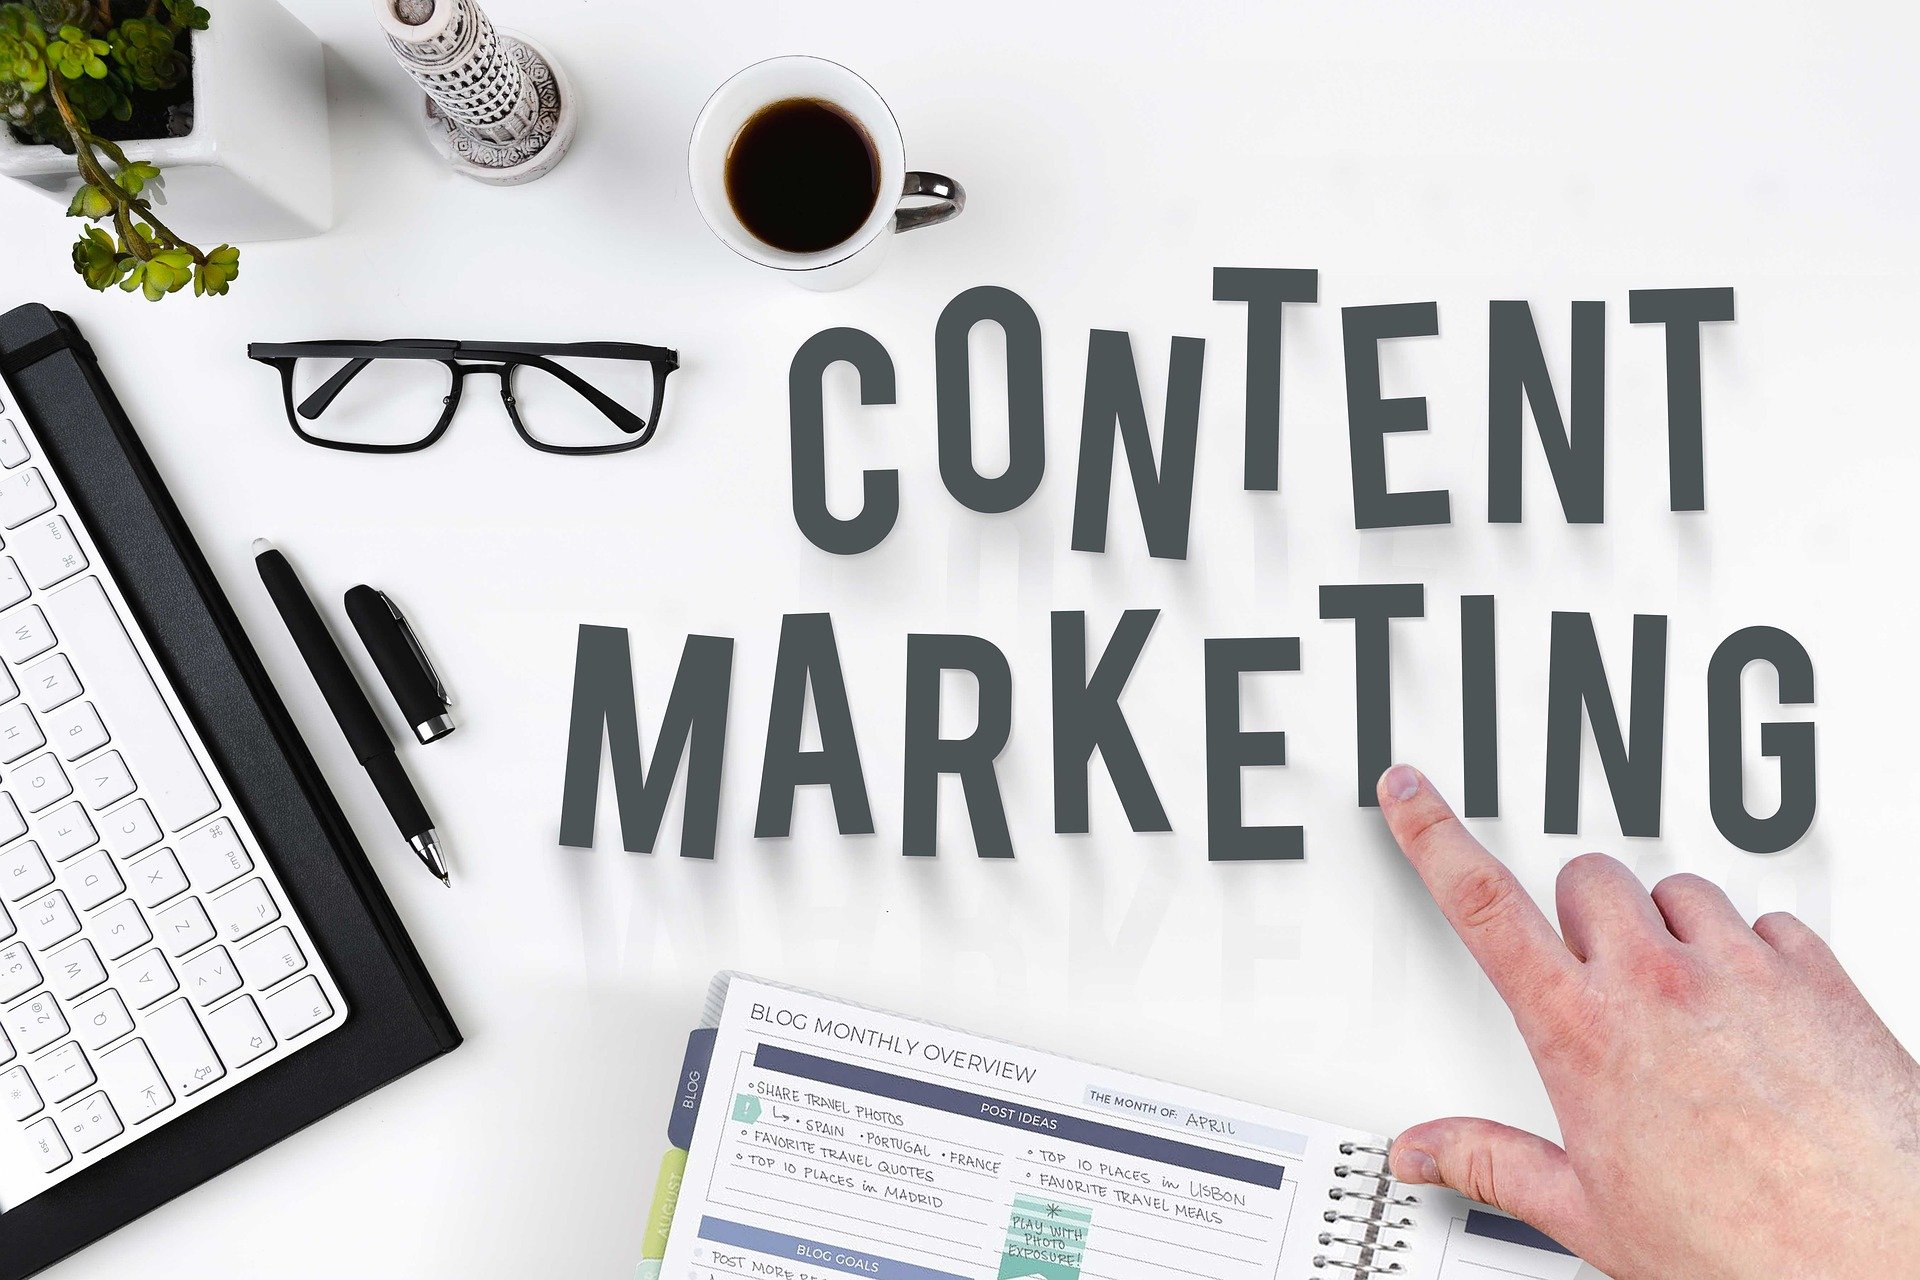 Organic Content Marketing